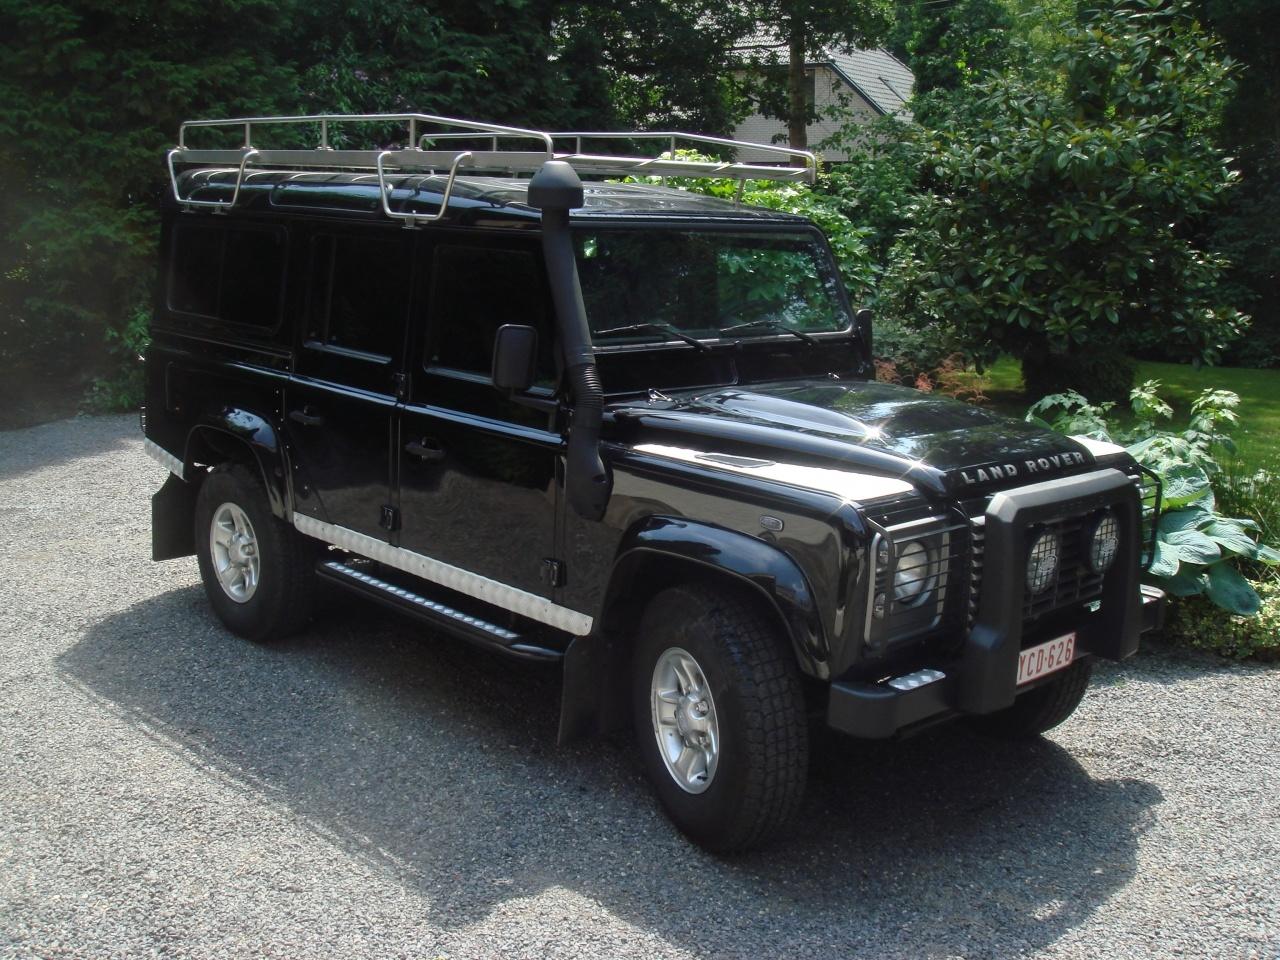 Imperiaal RVS Land Rover Defender 110